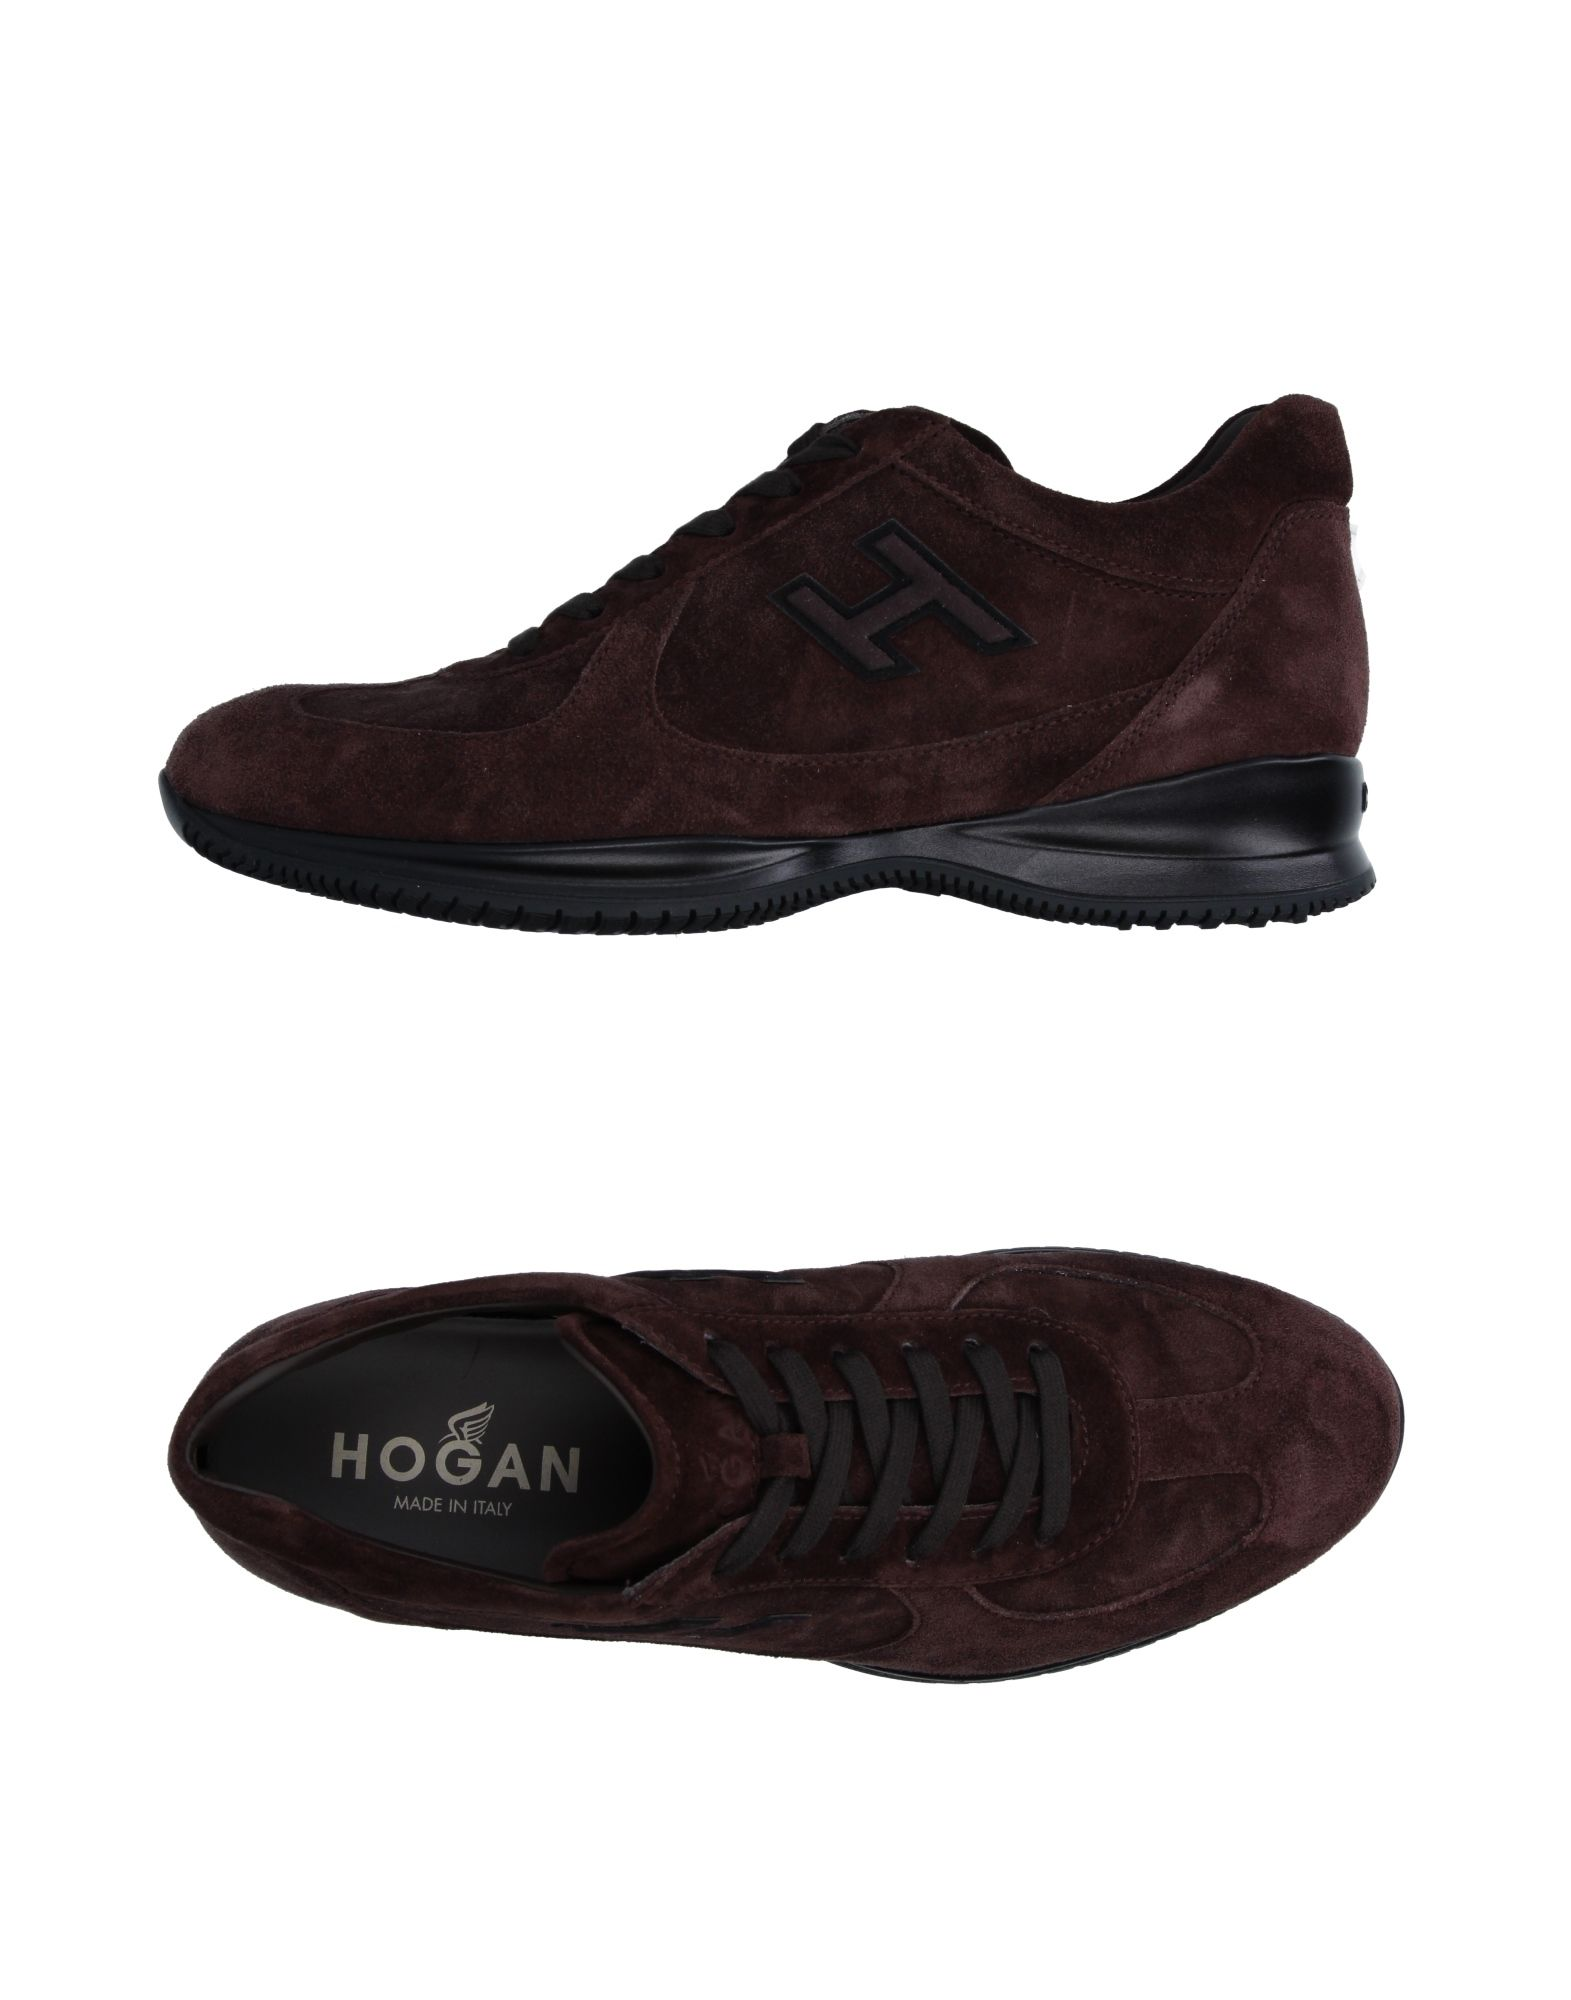 Hogan Sneakers Herren  11310206BL Gute Qualität beliebte Schuhe